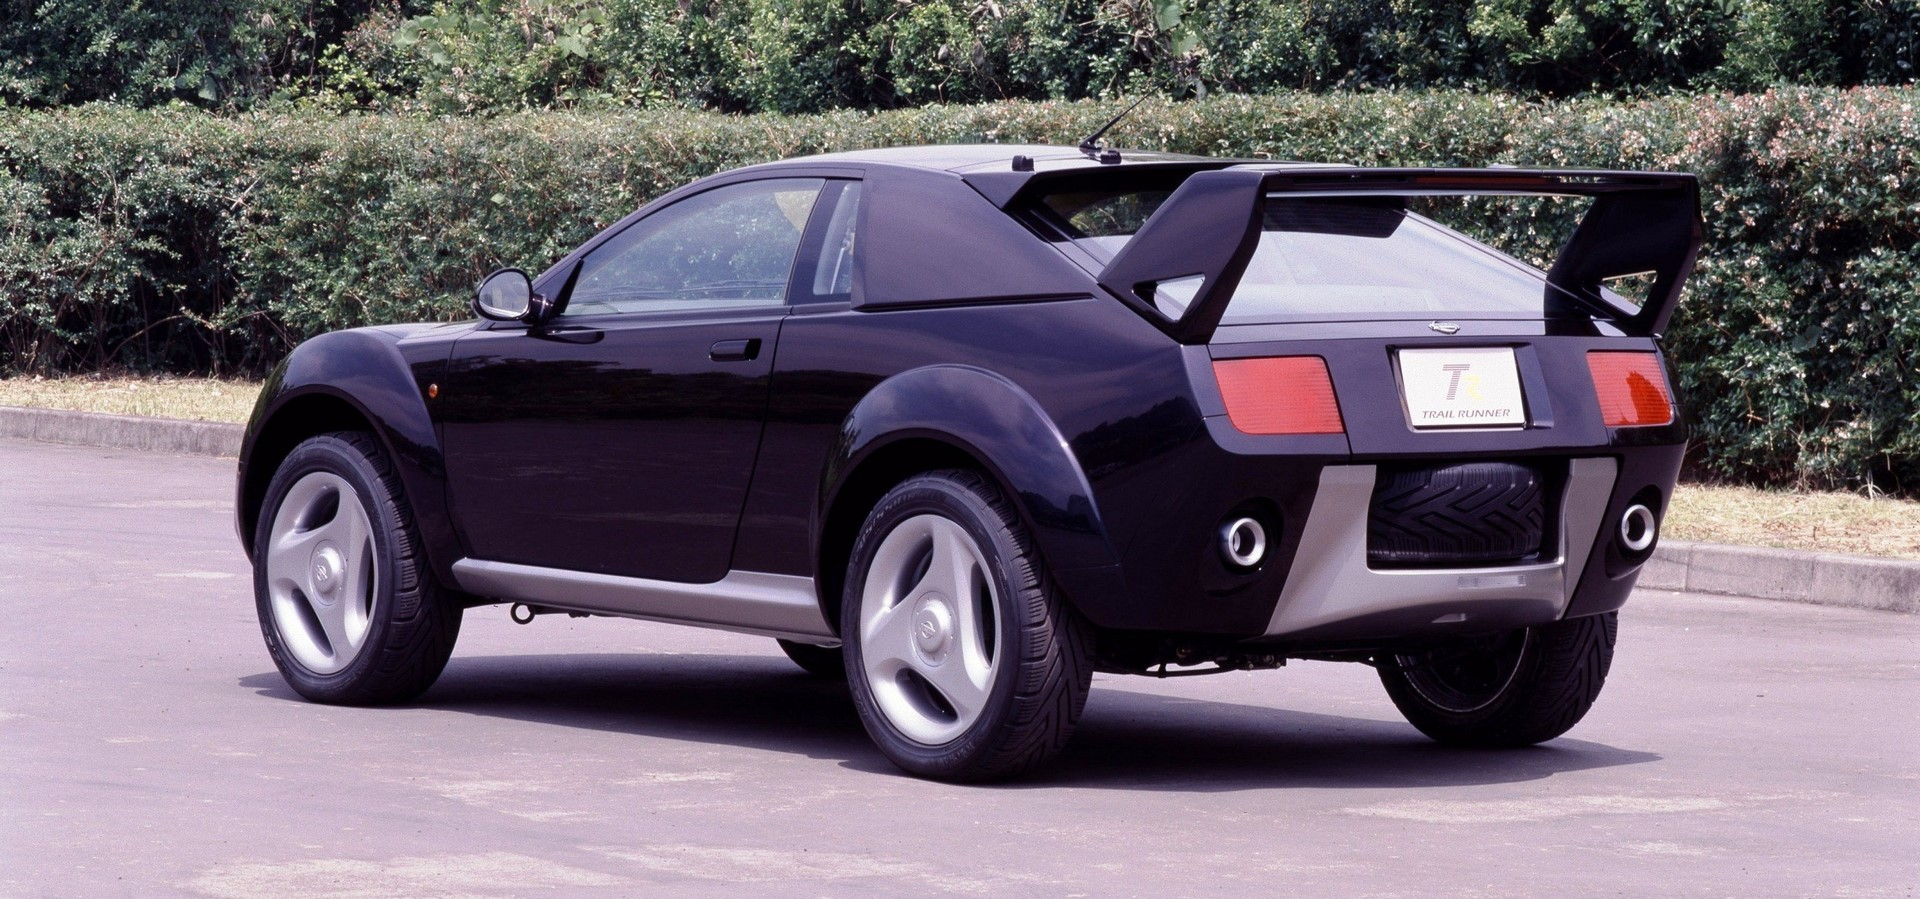 Nissan Trail Runner concept (2)